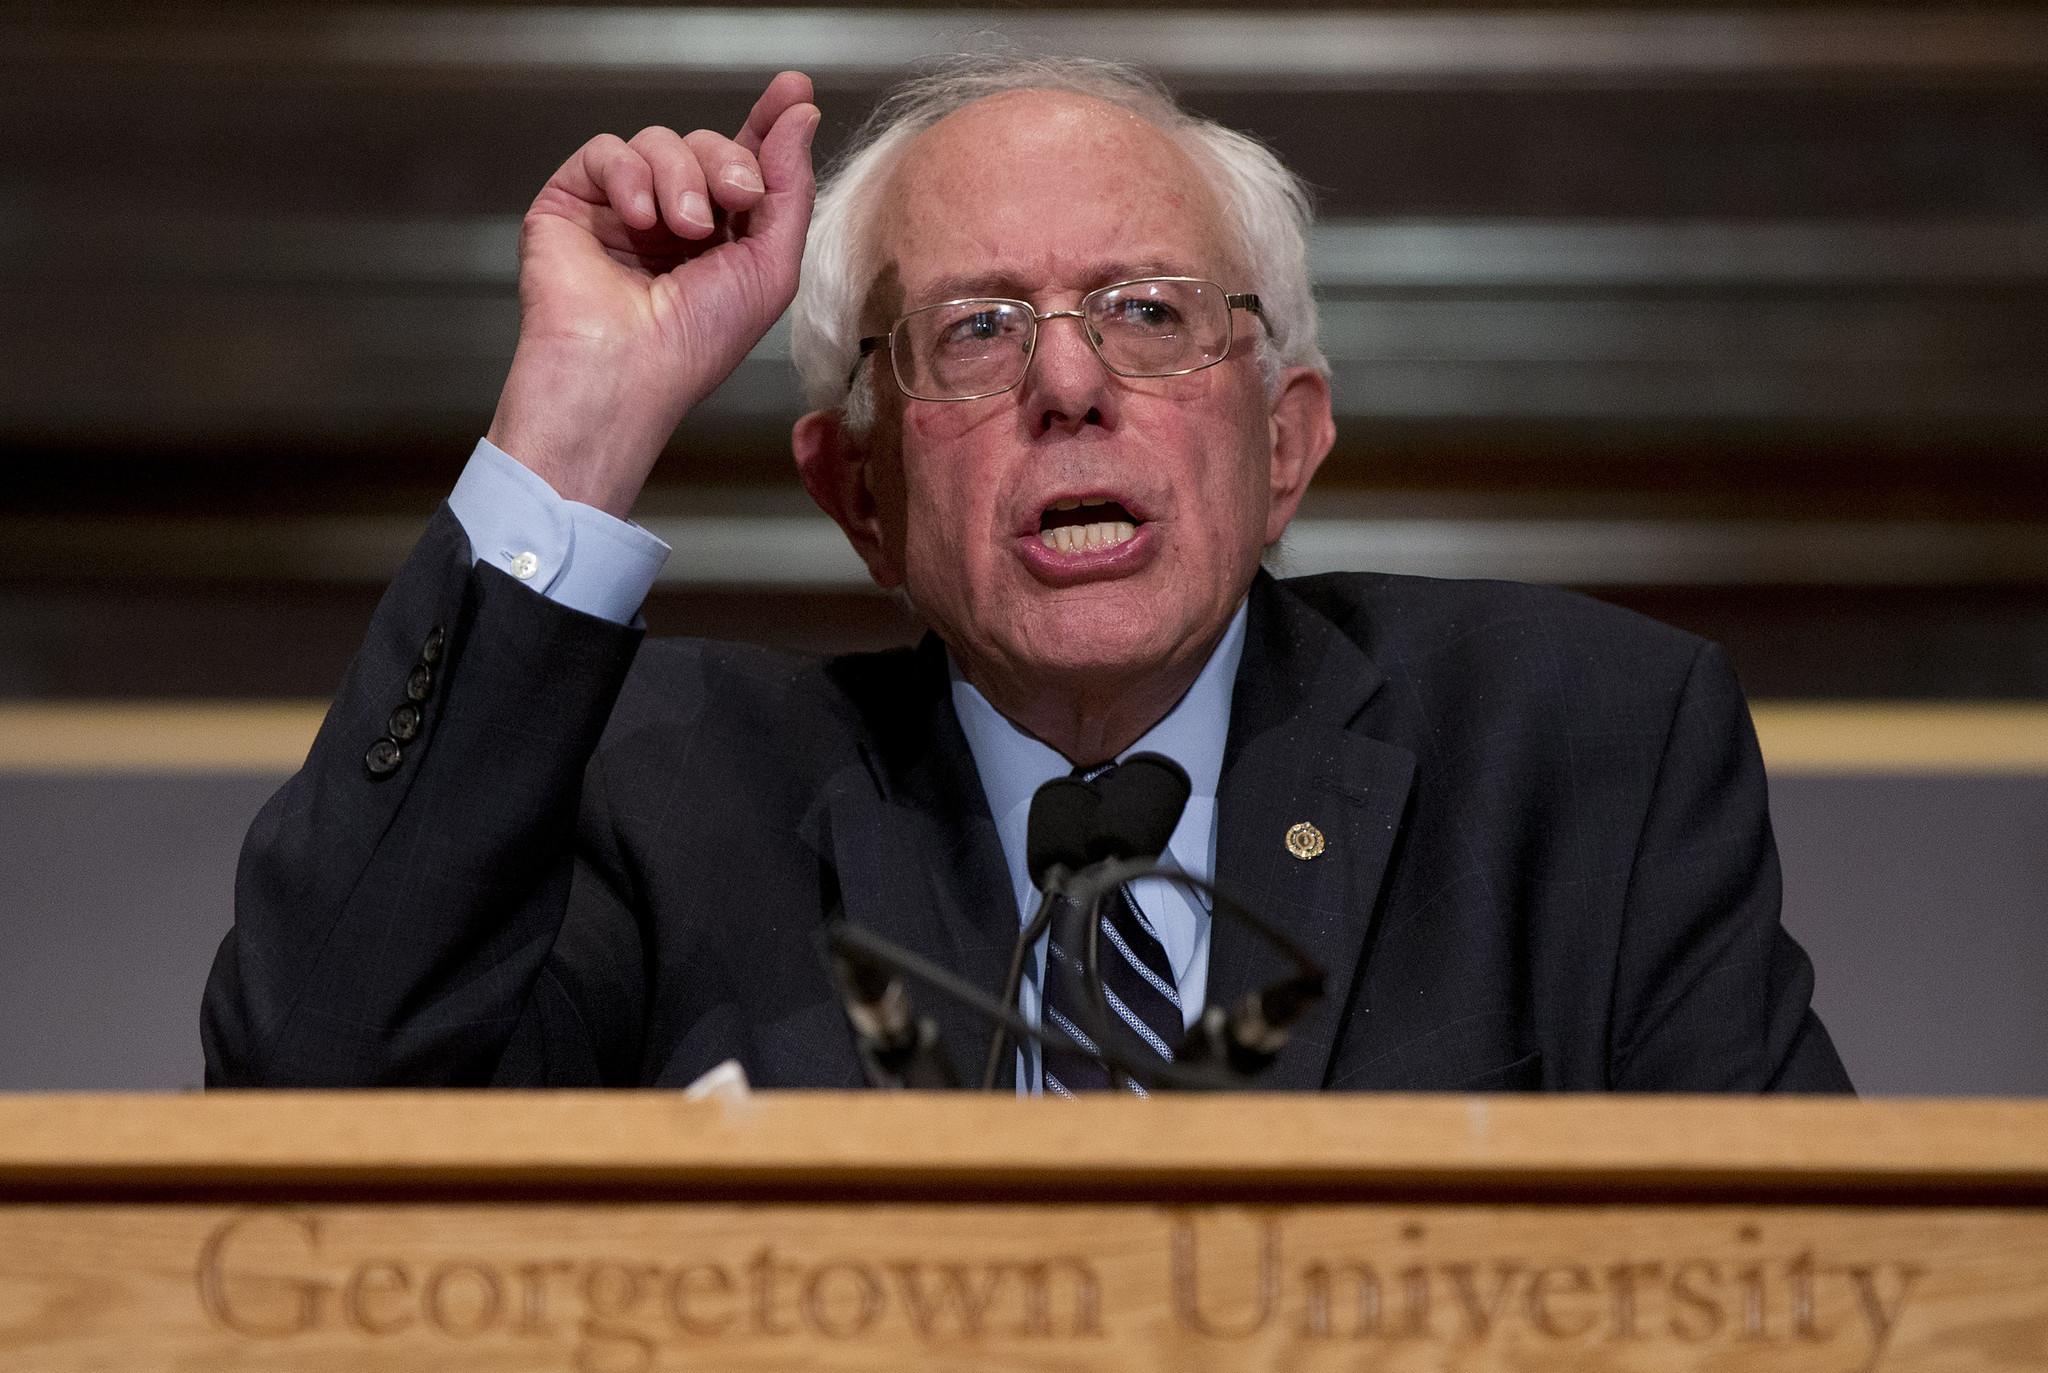 ct-bernie-sanders-democratic-socialism-20151123